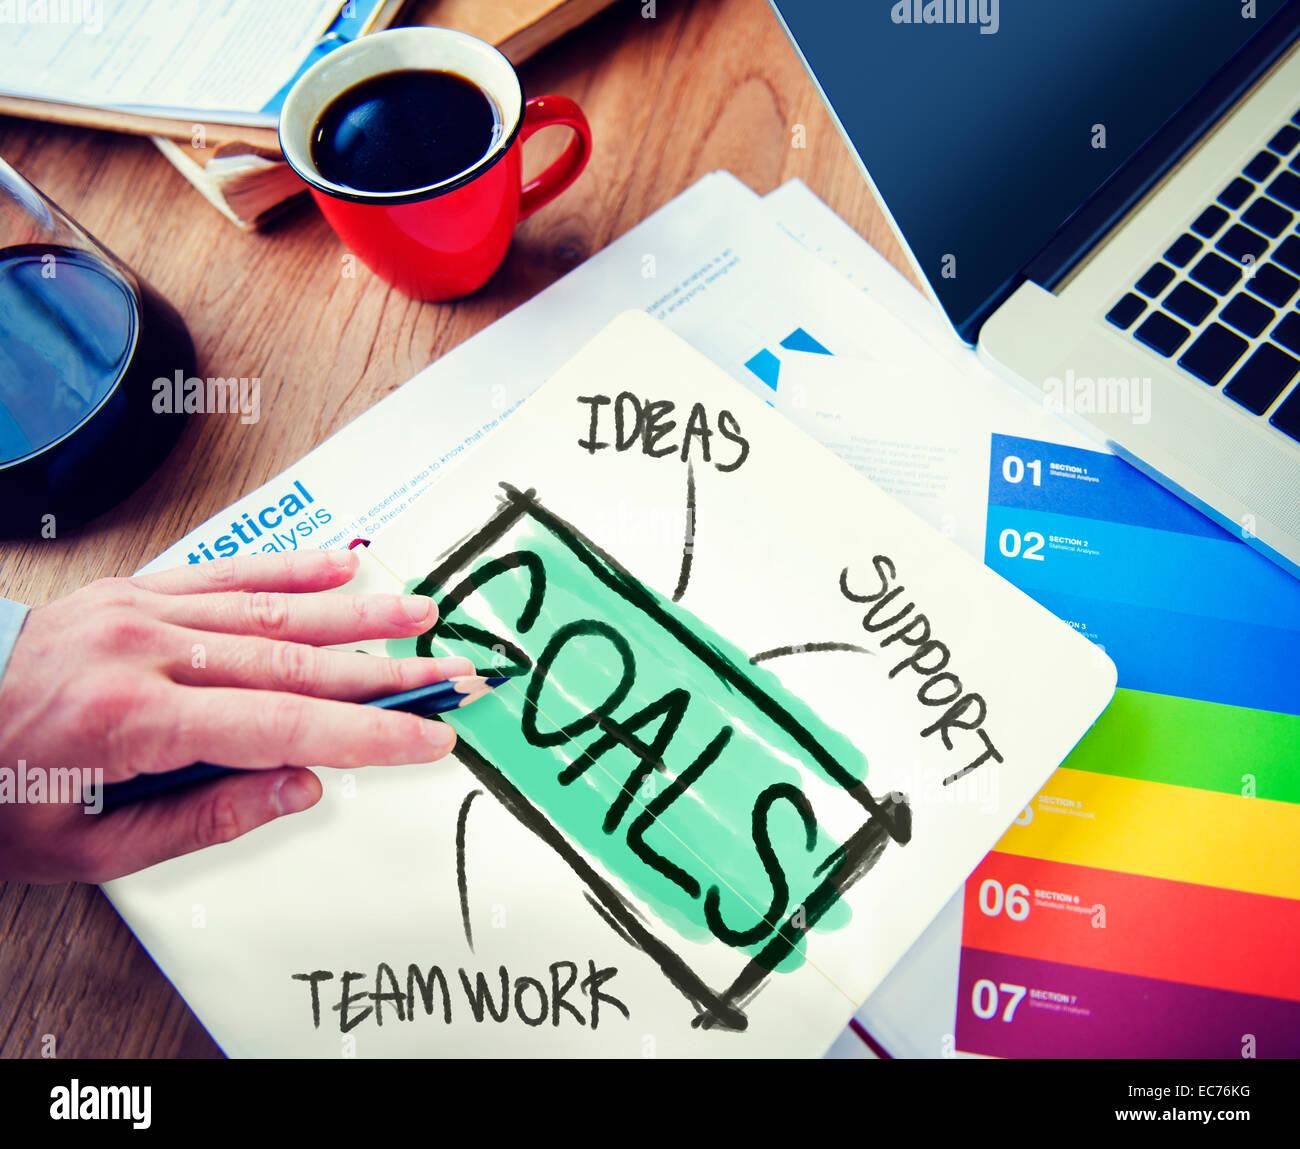 Businessman Notepad Goals Ideas Support Teamwork Concept - Stock Image